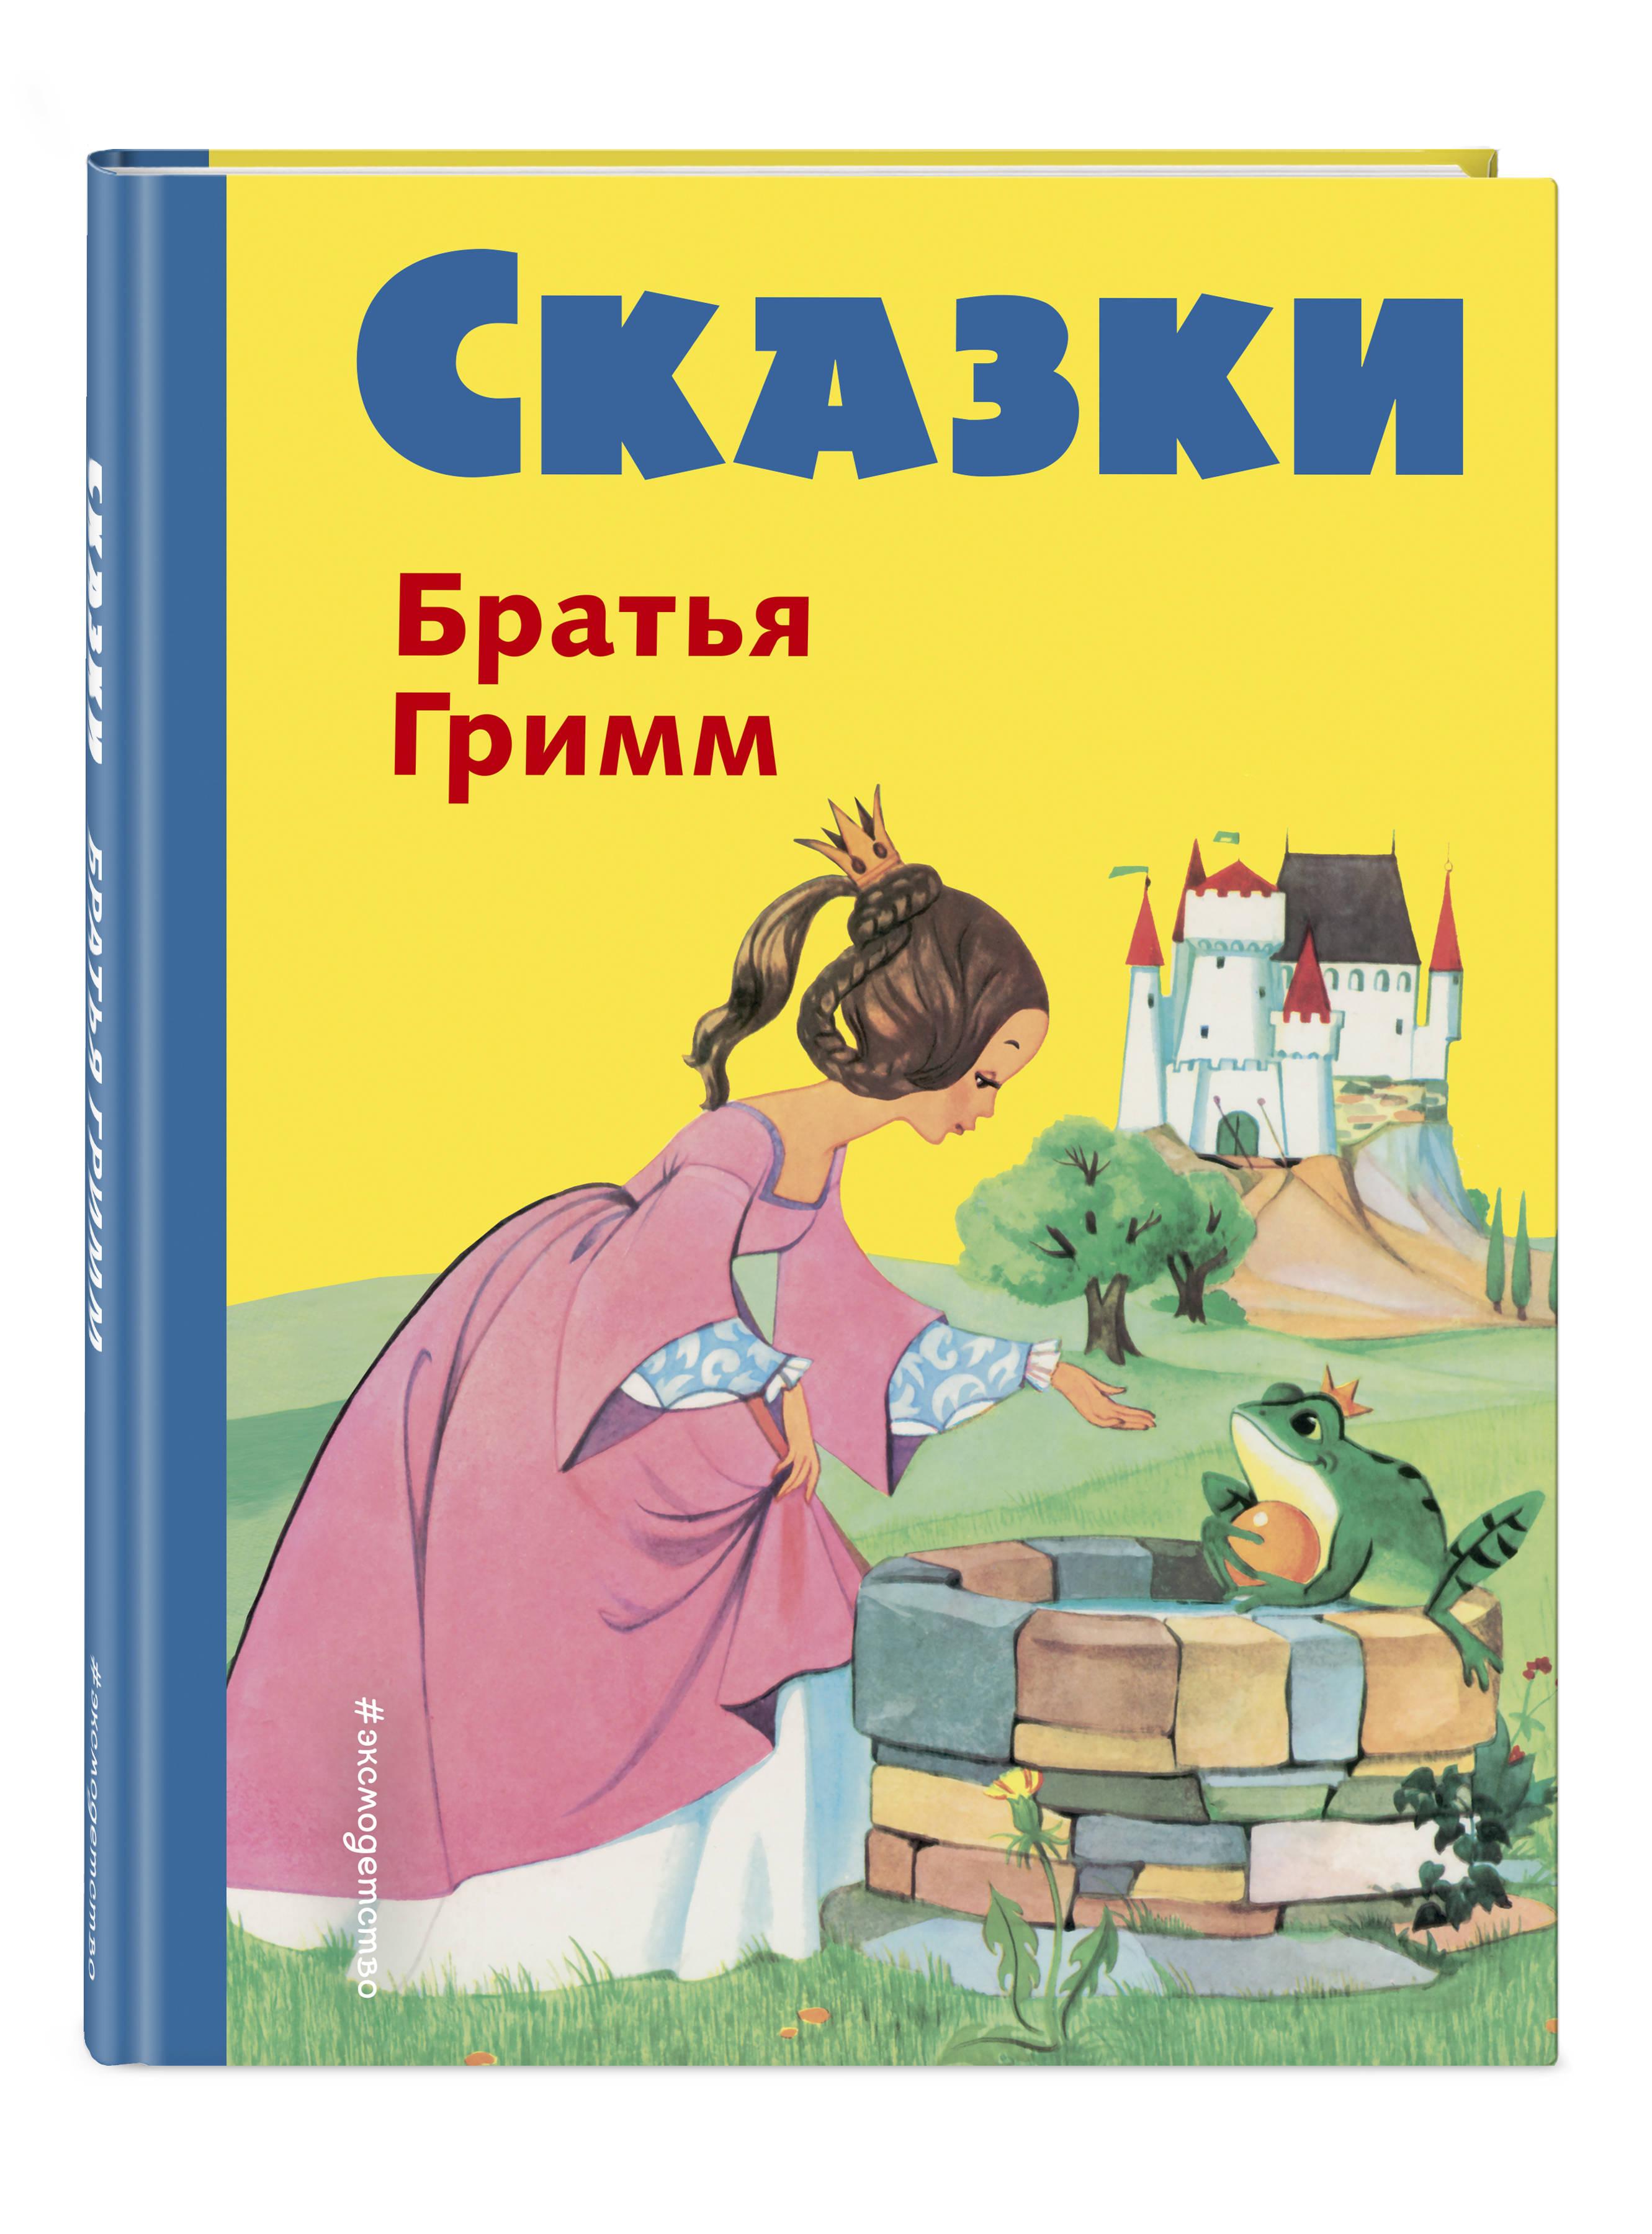 Братья Гримм Сказки братьев Гримм (желт.) (ил. Ф. Кун, А. Хоффманн)